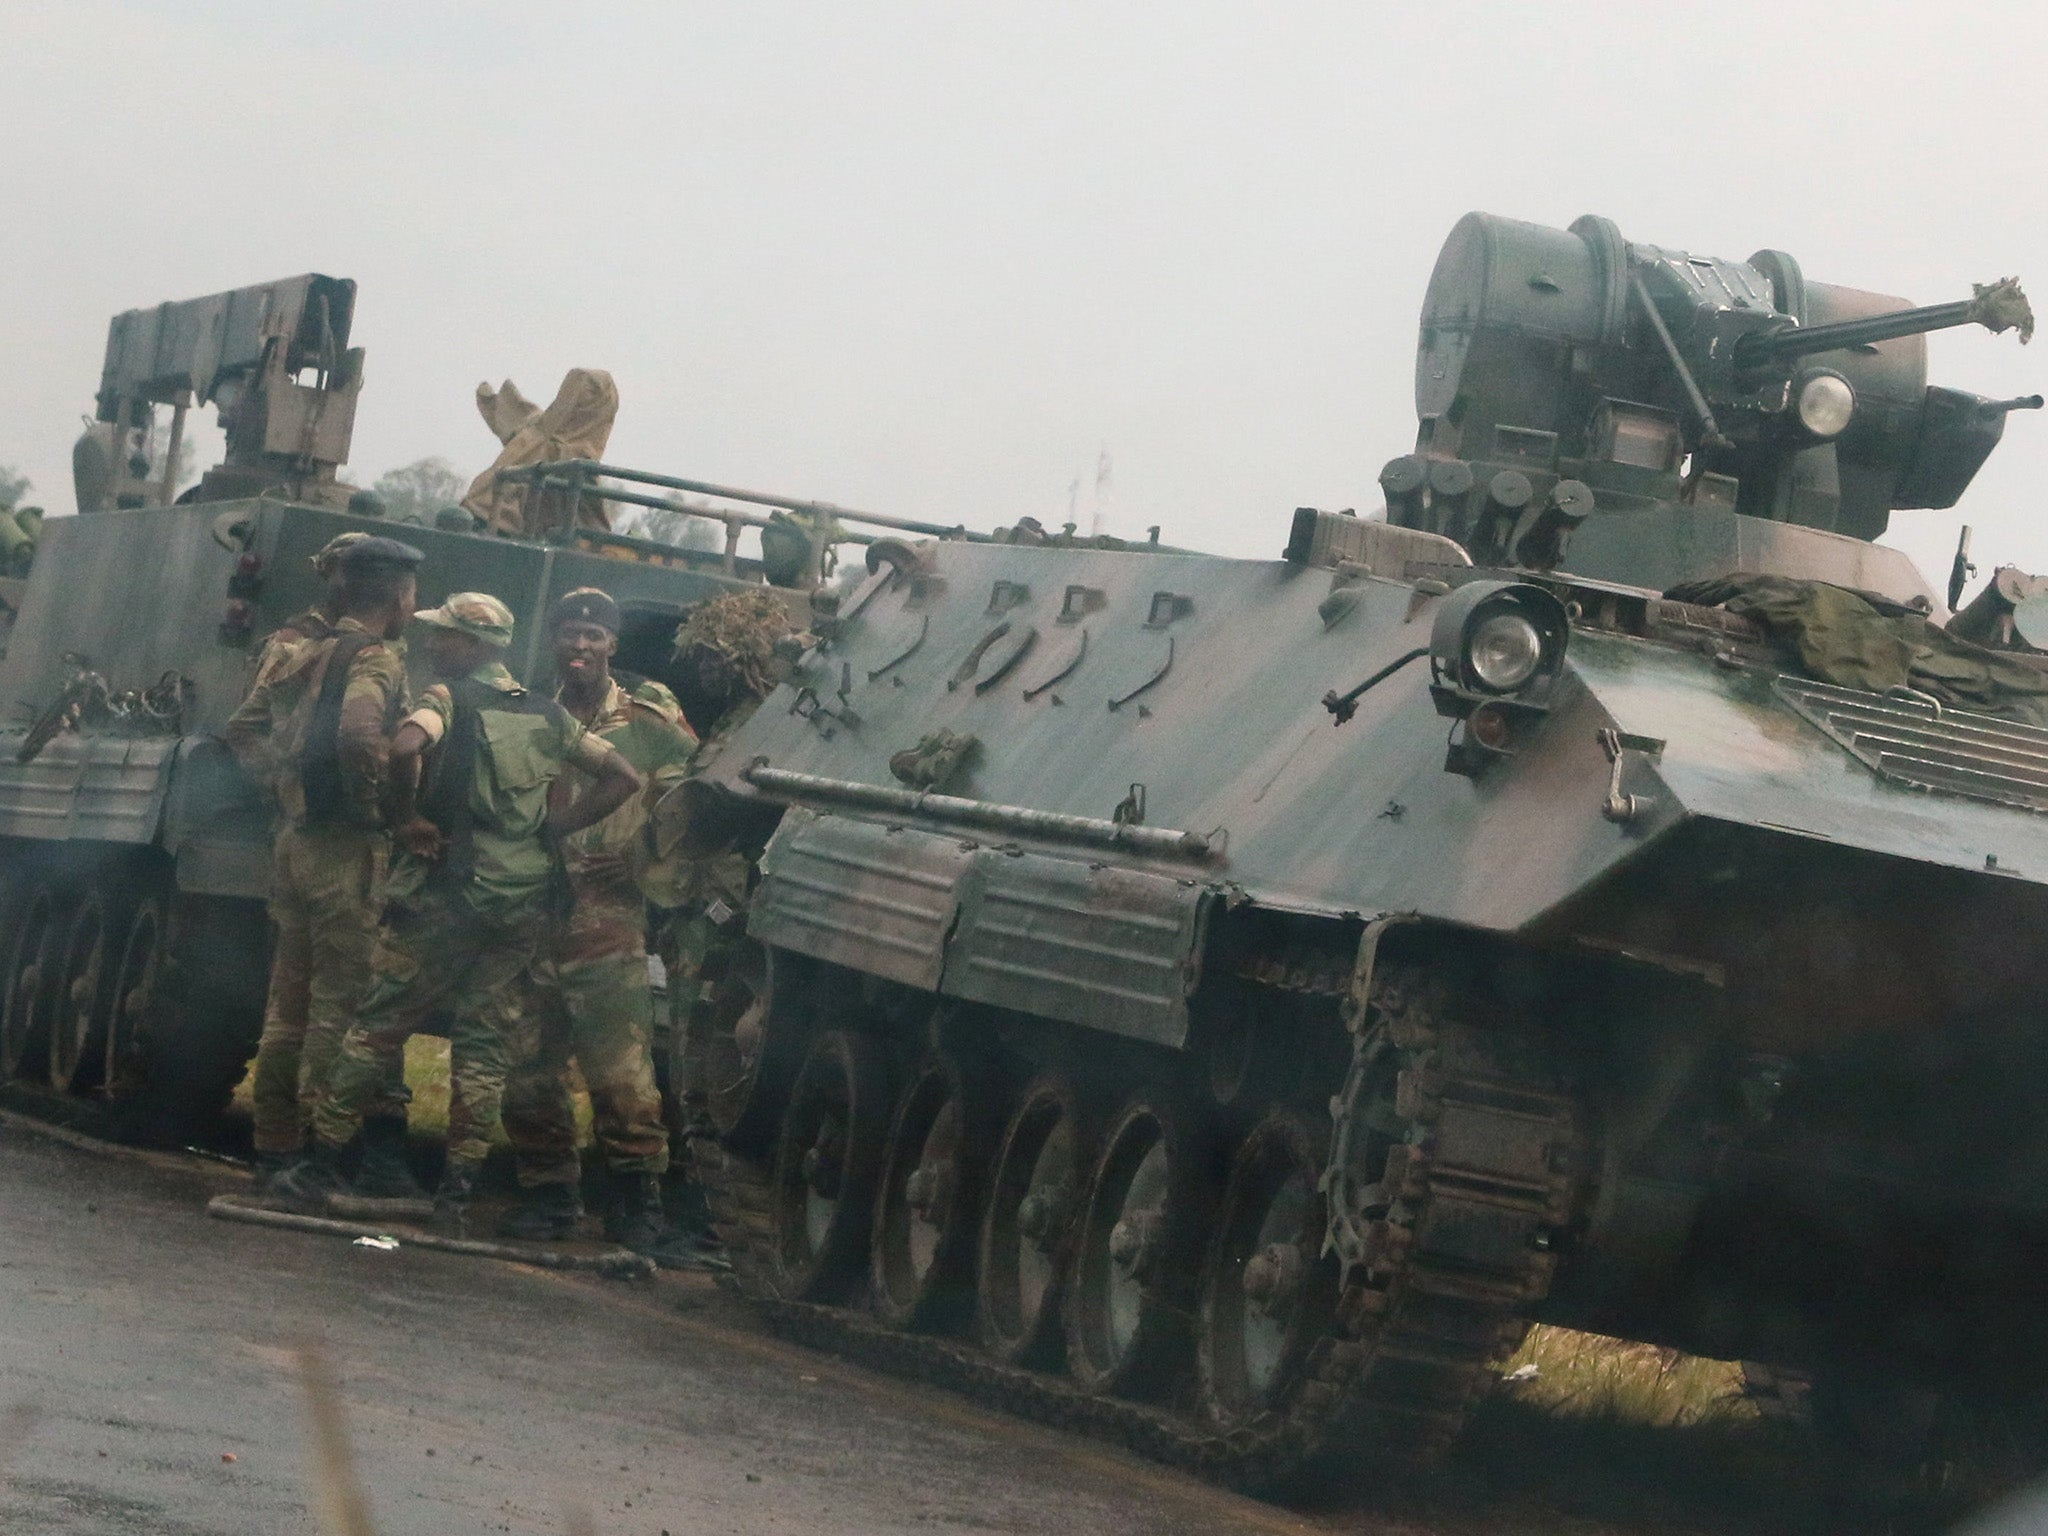 Robert Mugabe's party accuses army of treason as tanks take to streets of Zimbabwe